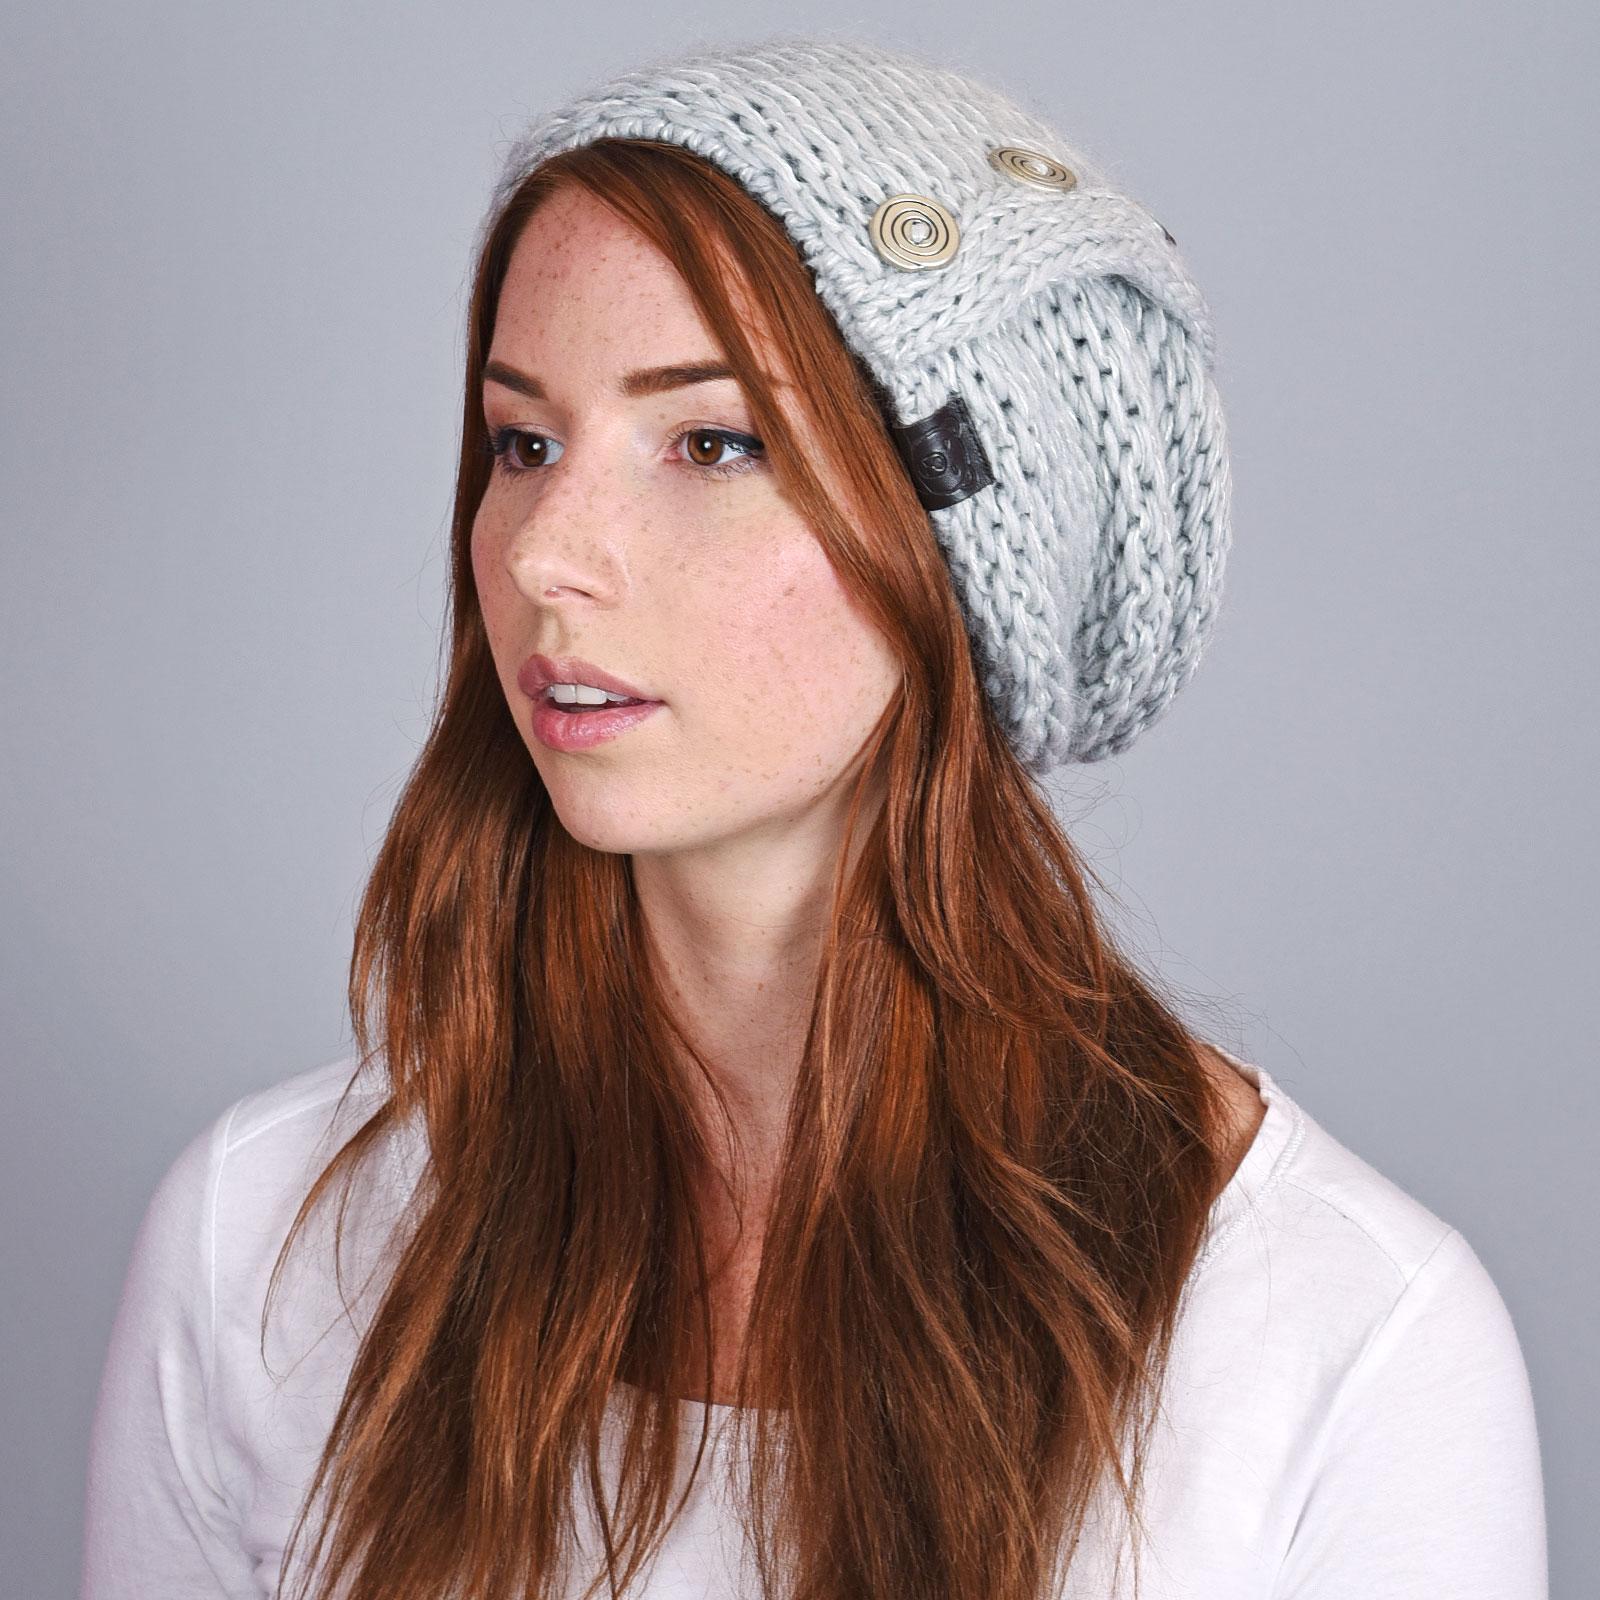 CP-01065-VF16-1-bonnet-femme-fantaisie-gris